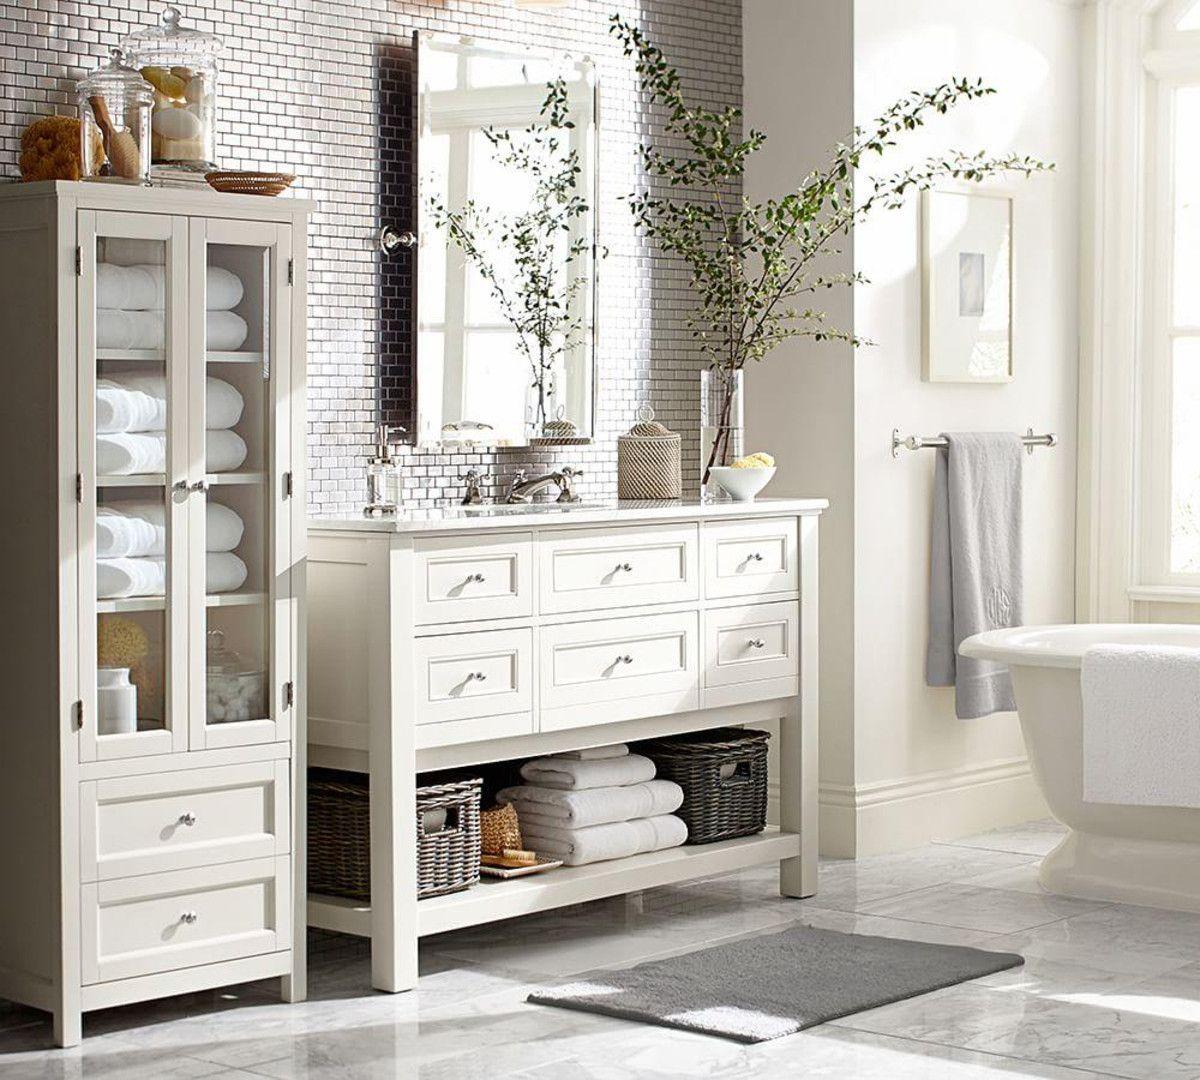 Kensington Pivot Rectangular Mirror | bathroom ideas | Pinterest ...